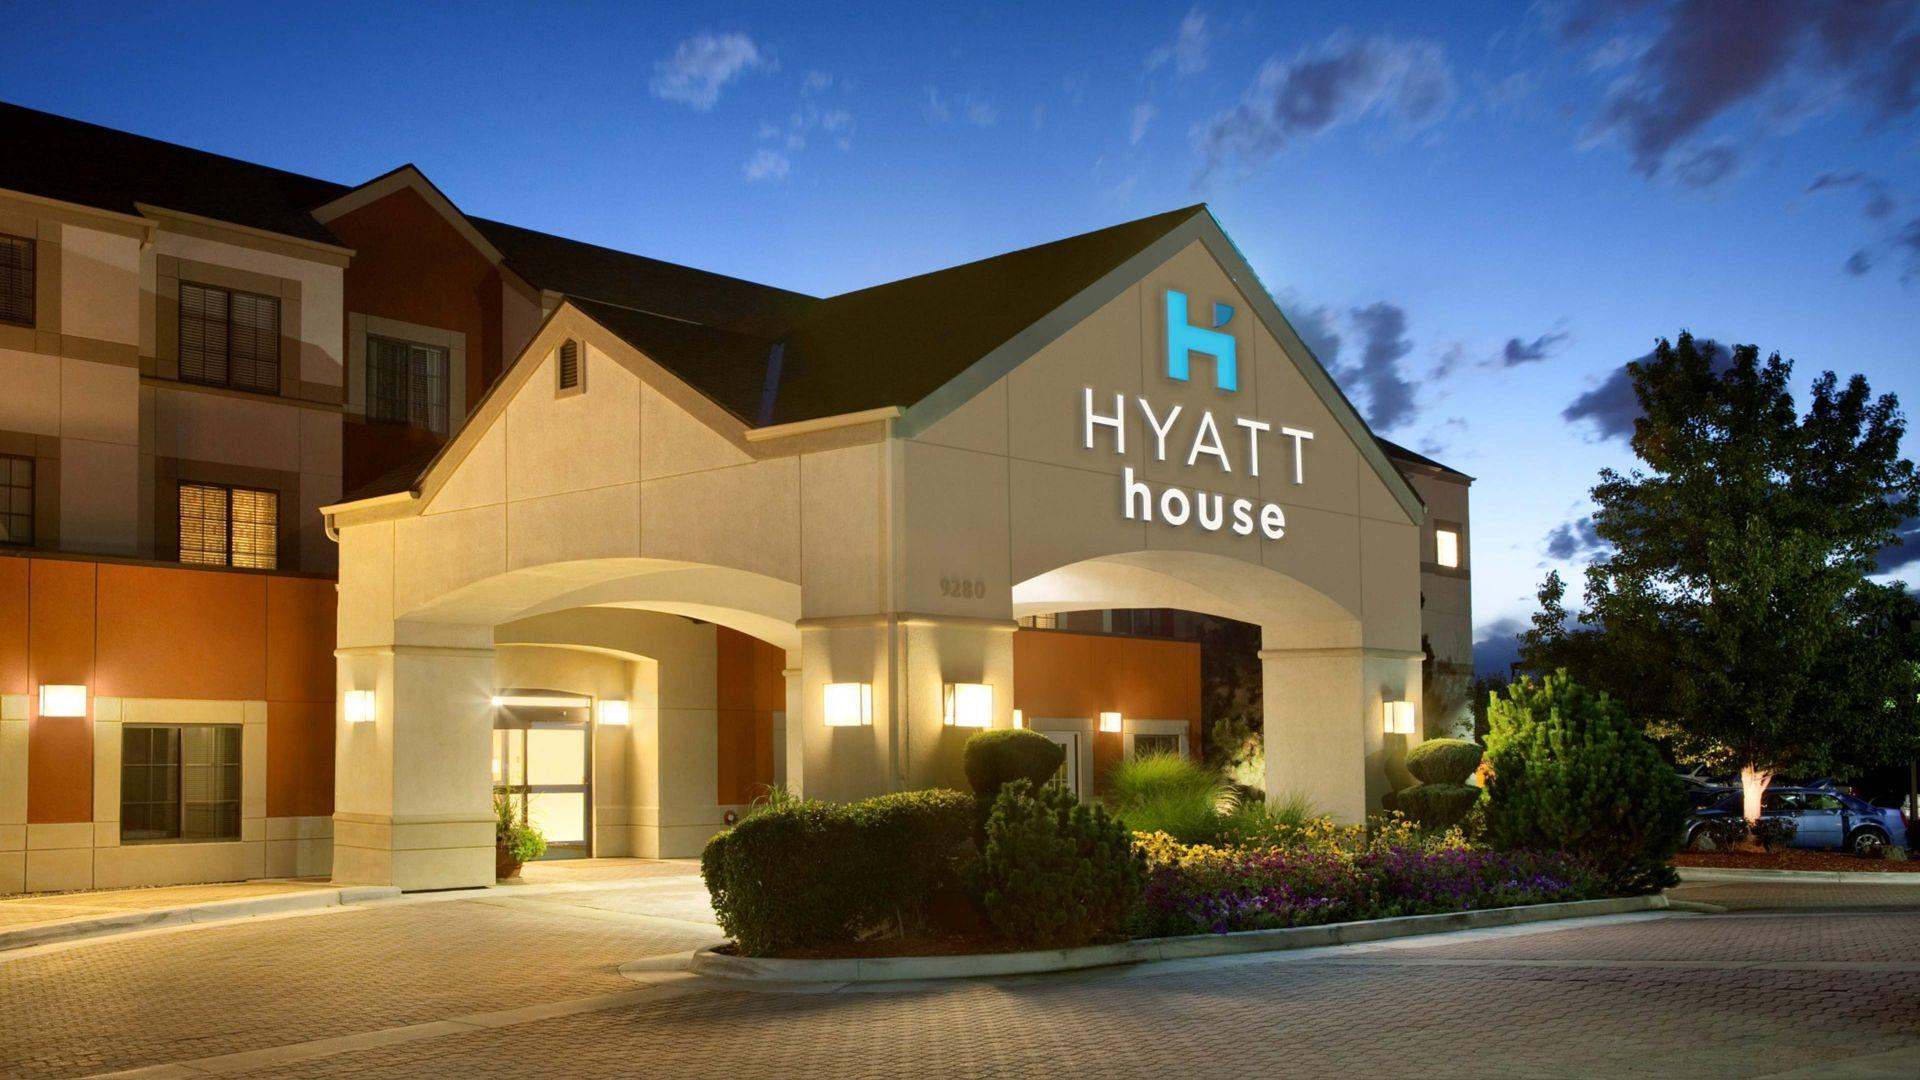 Hyatt House Bryan College Station